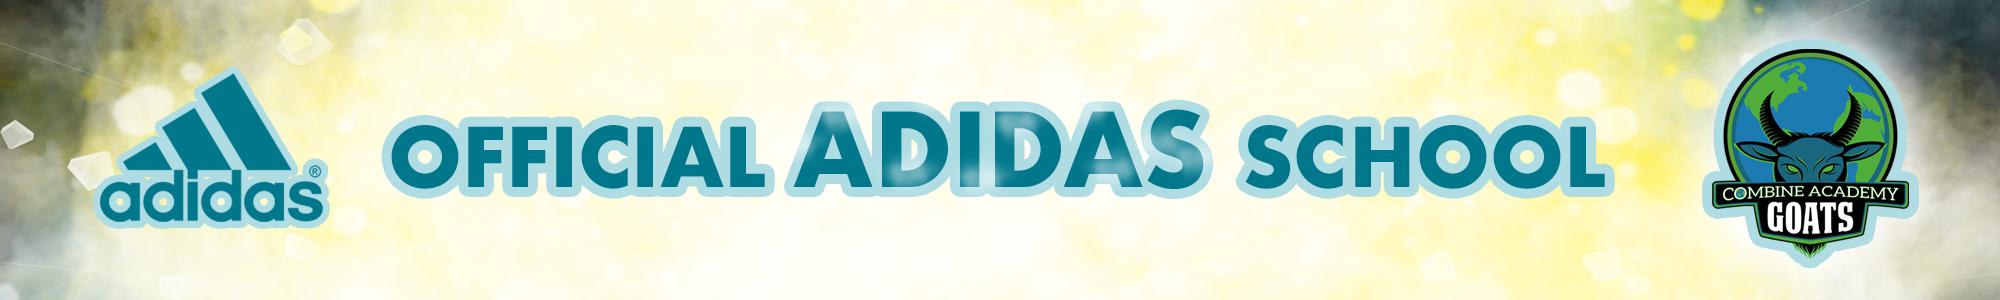 Combine Academy Official Adidas School